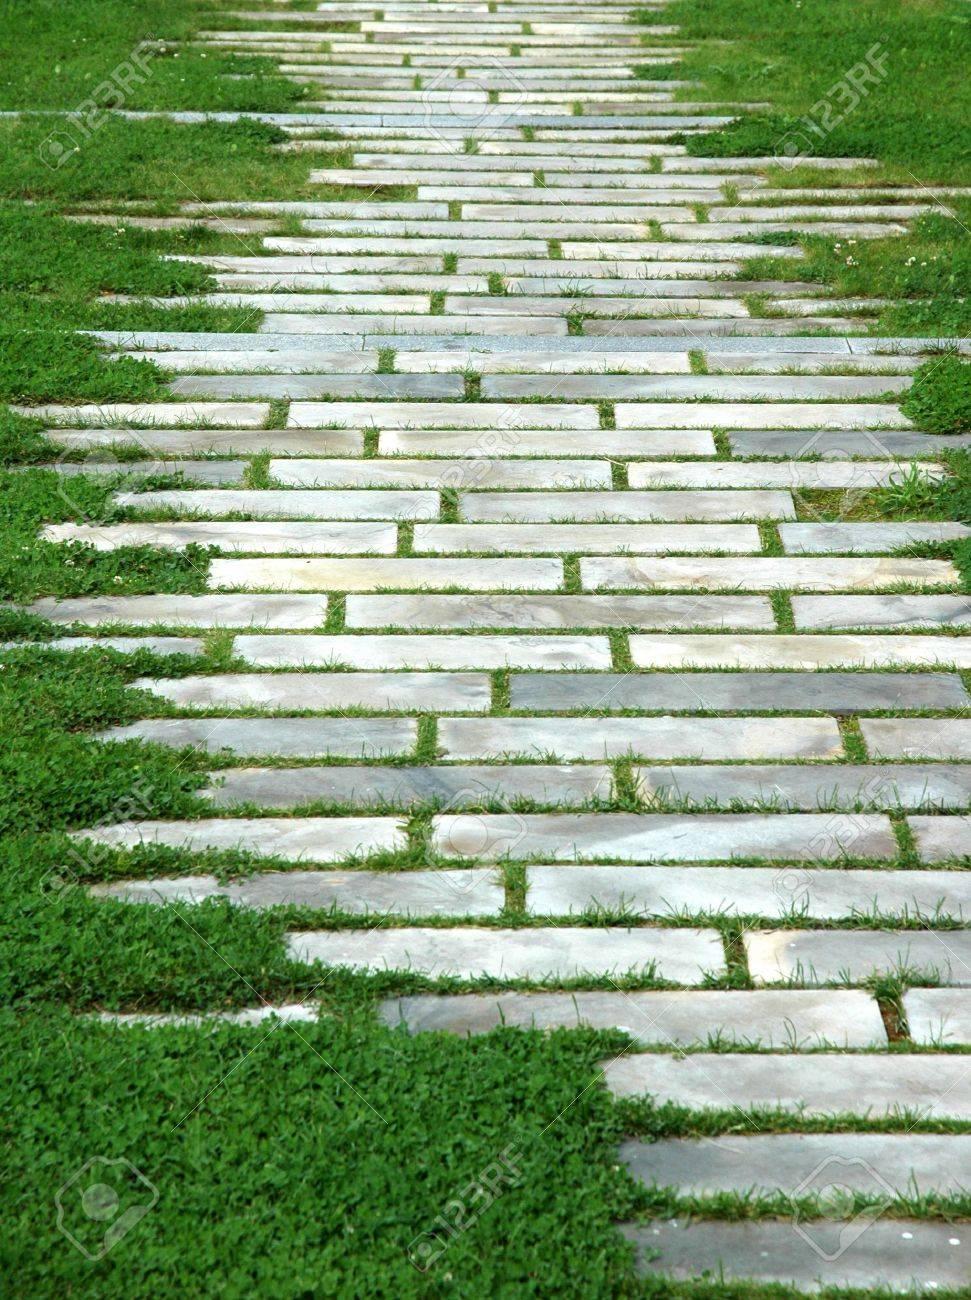 geometric pattern on grass Stock Photo - 5304520